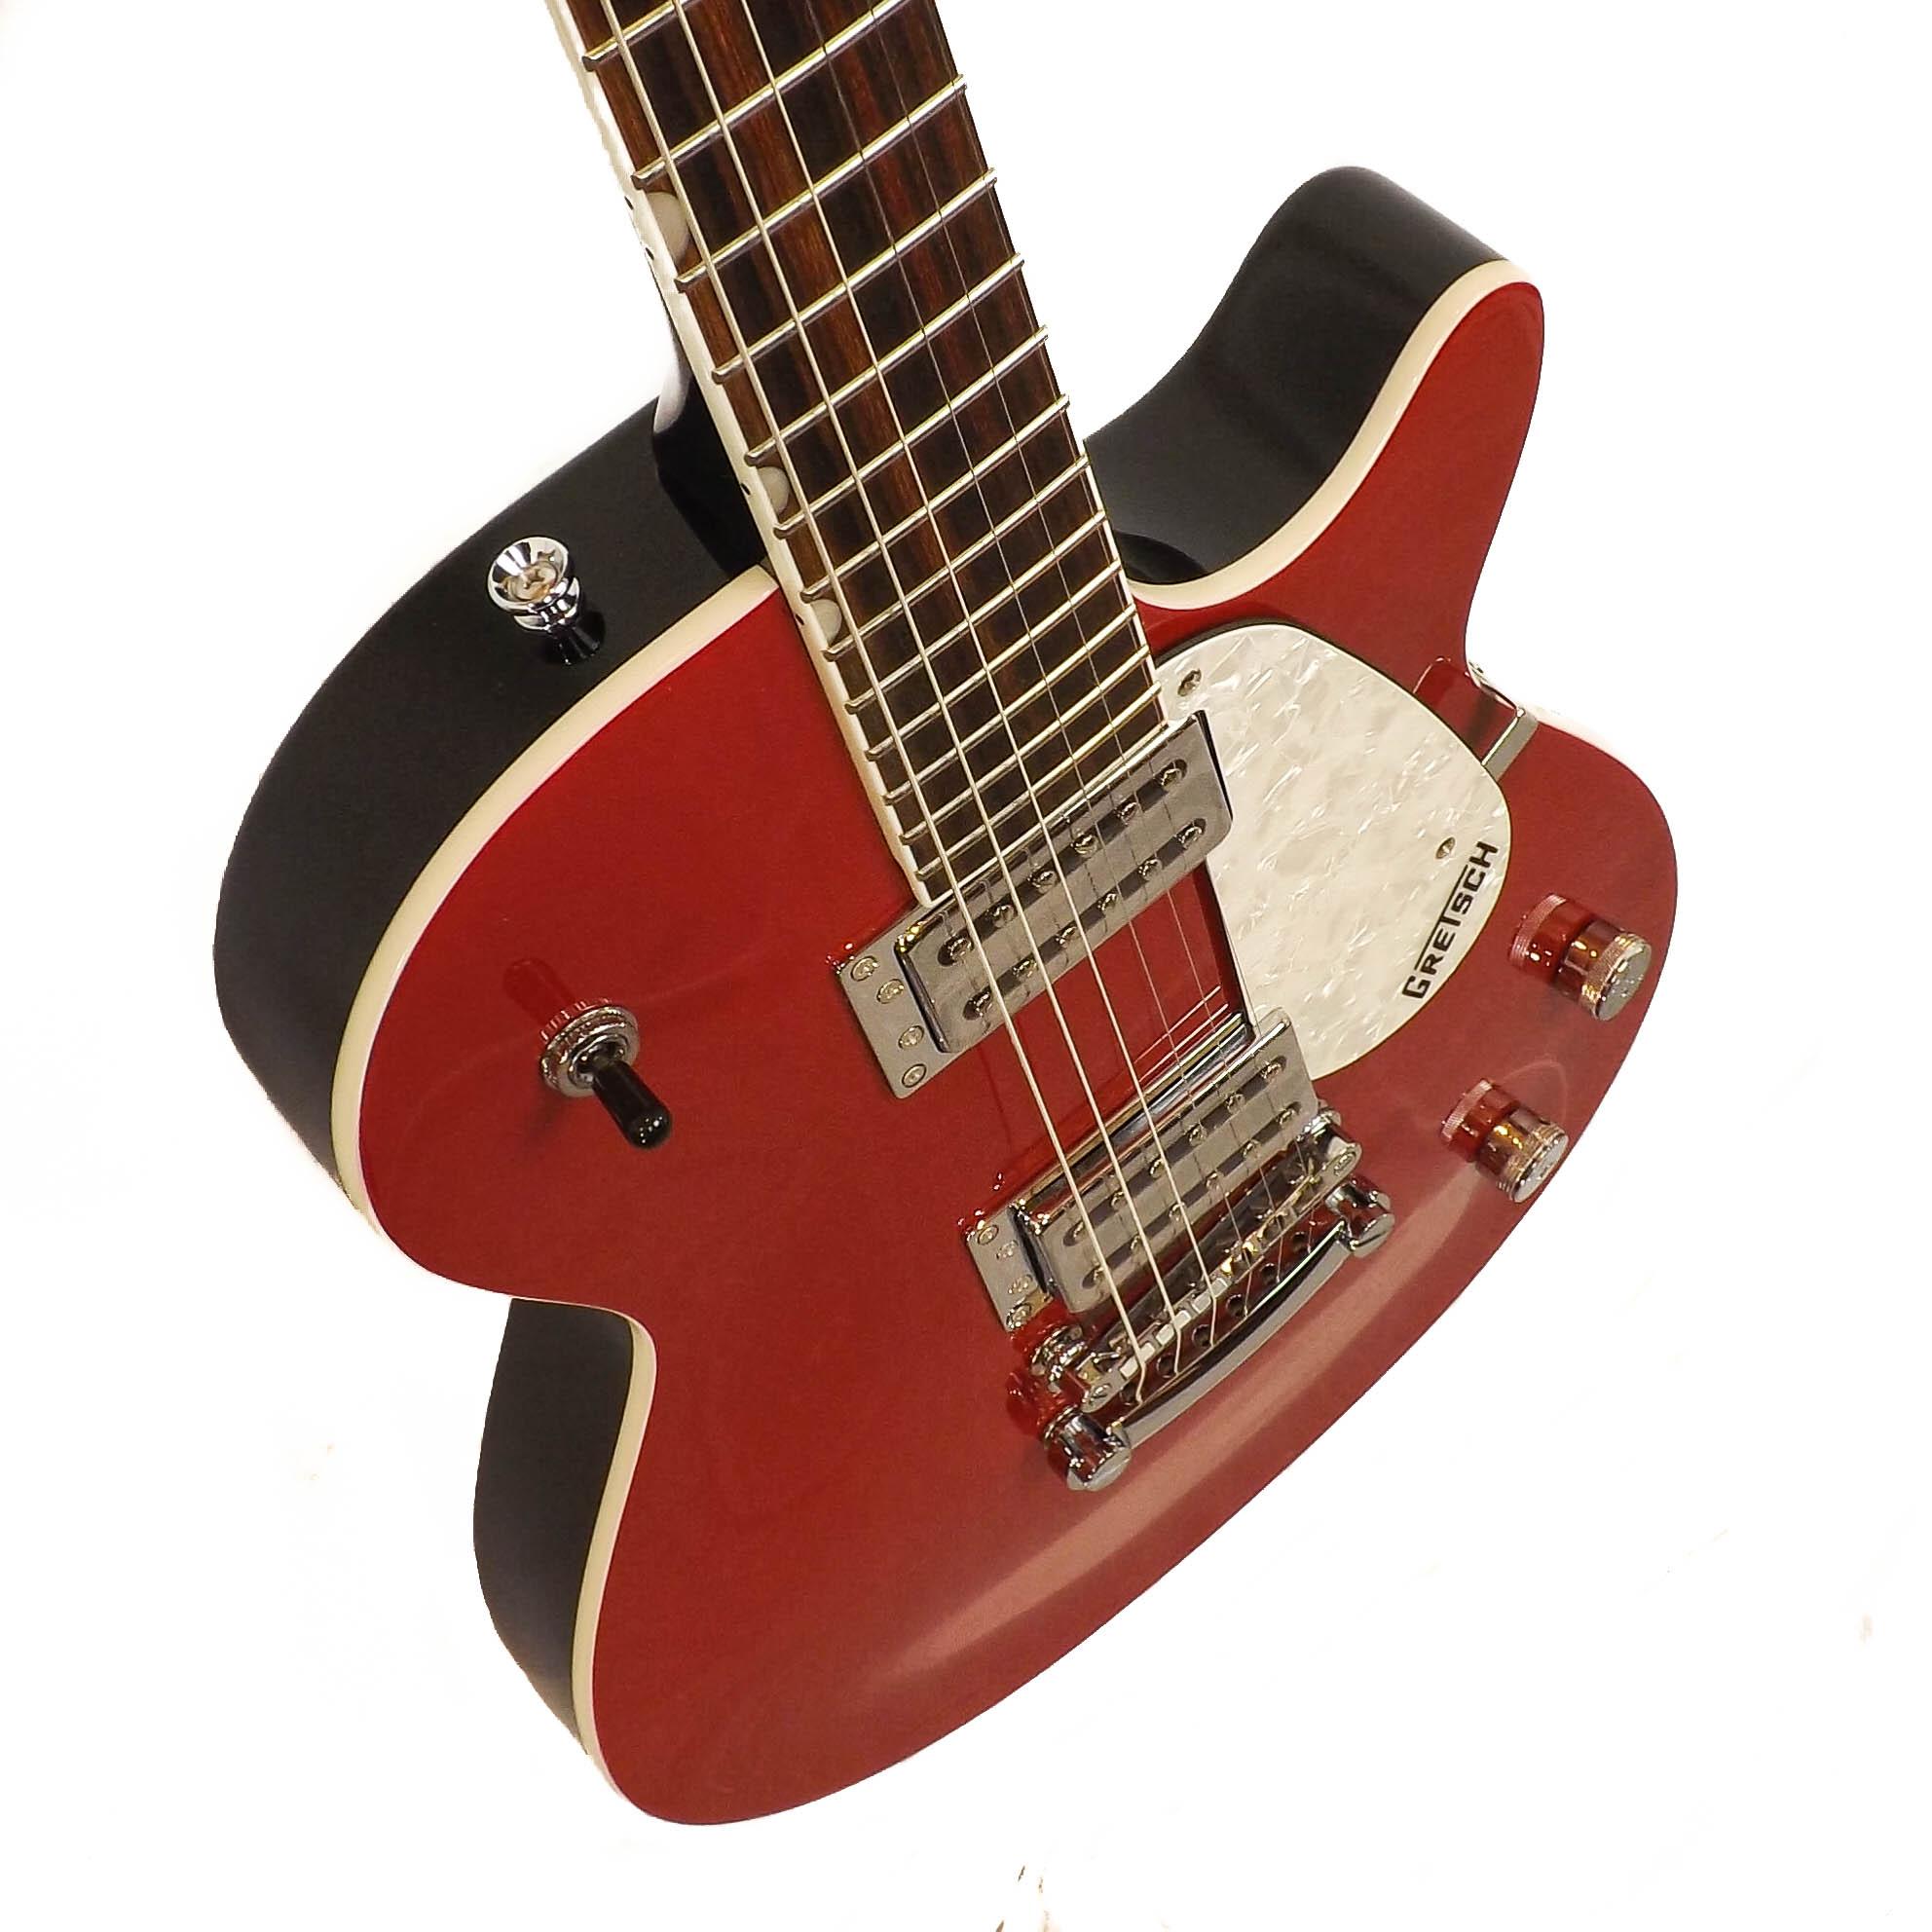 gretsch electromatic g5421 jet club guitar in firebird red music world. Black Bedroom Furniture Sets. Home Design Ideas